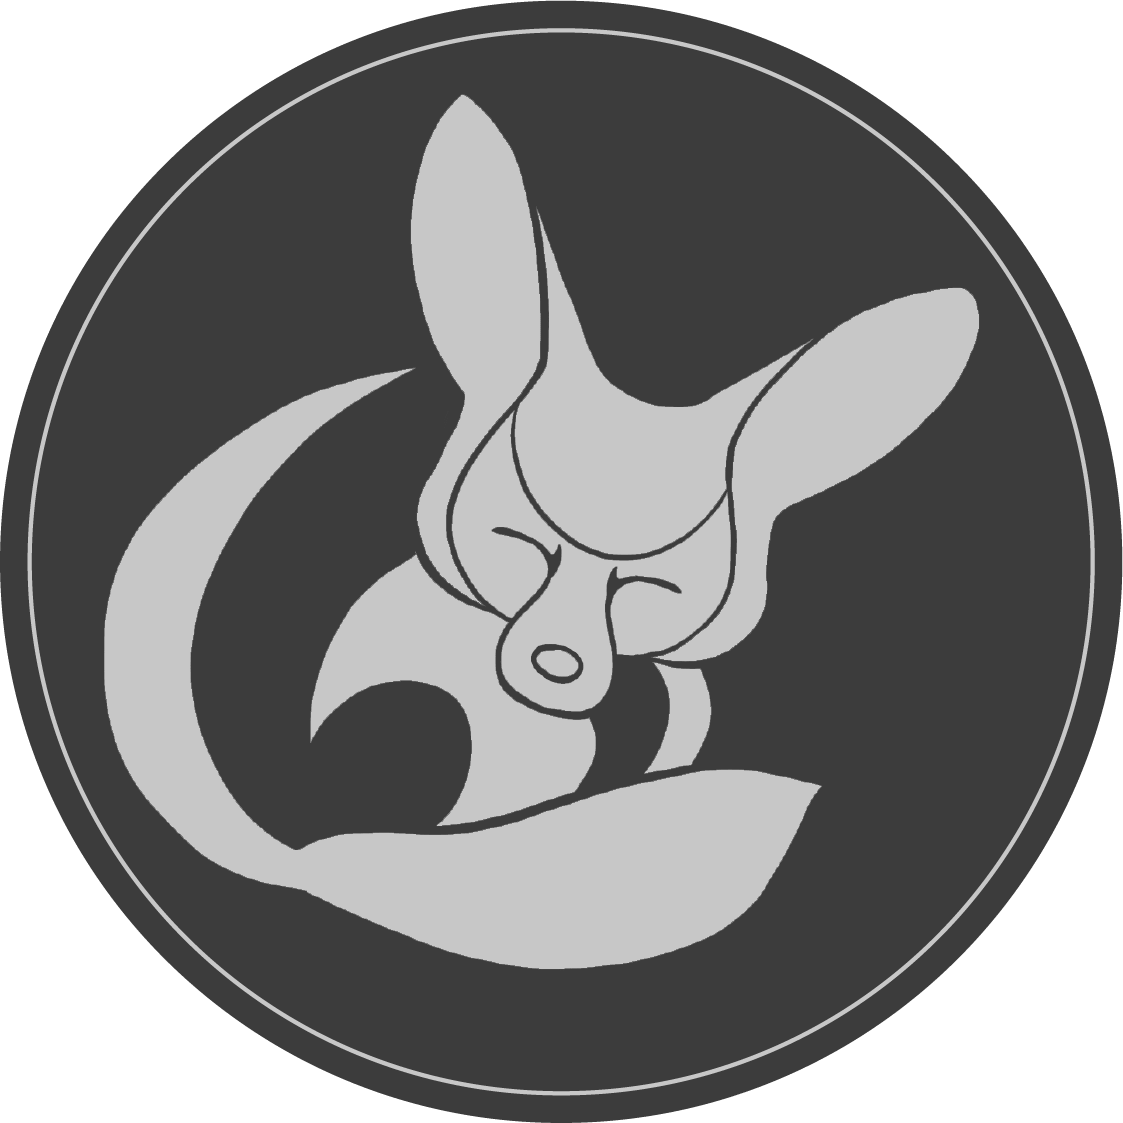 The Nomad Fox